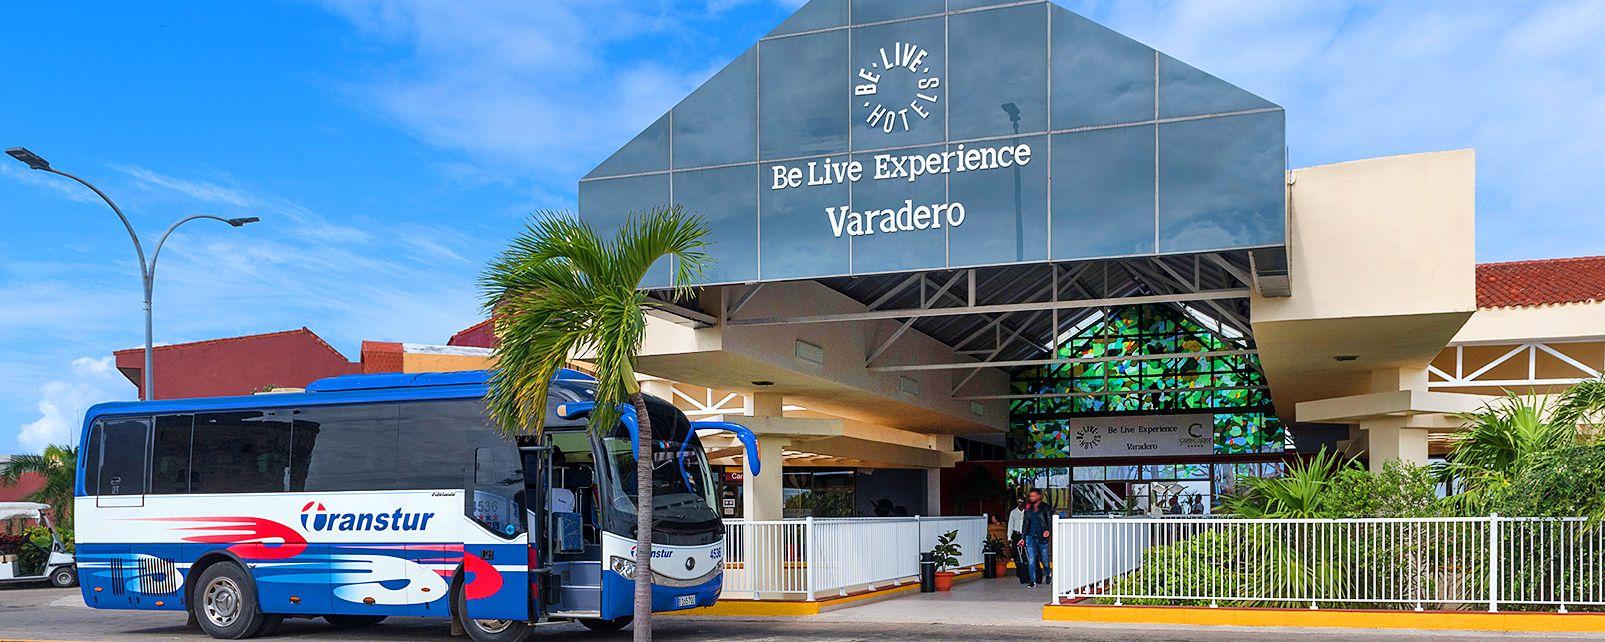 Hôtel Be Live Experience Varadero